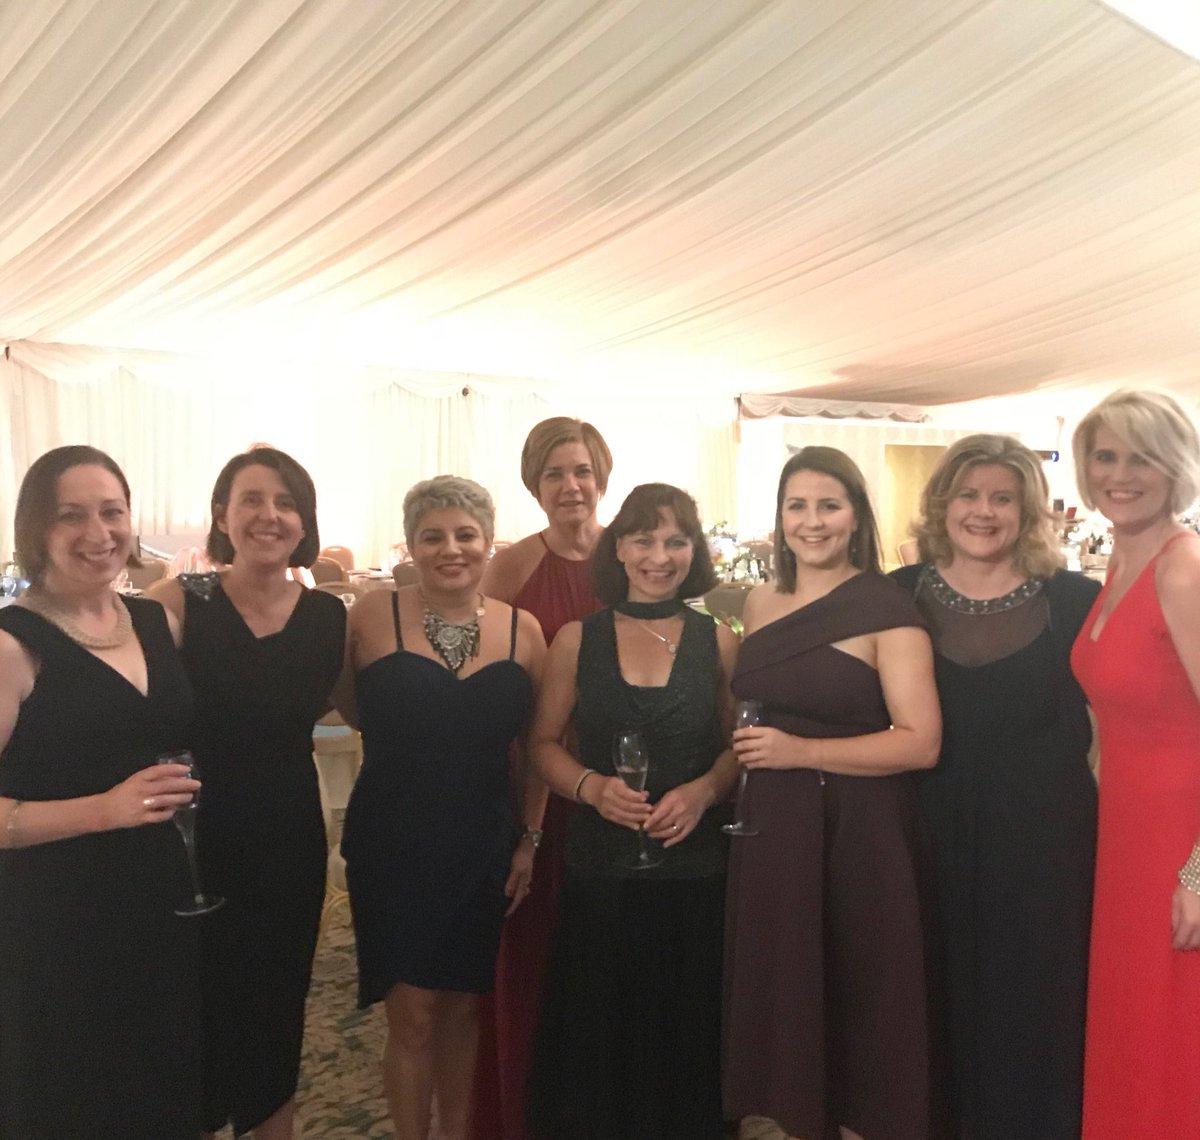 Amazing evening with generous Teesside business people @teessidecharity #sharesuccess #mbro #philanthropic <br>http://pic.twitter.com/GFDKhGCHqx